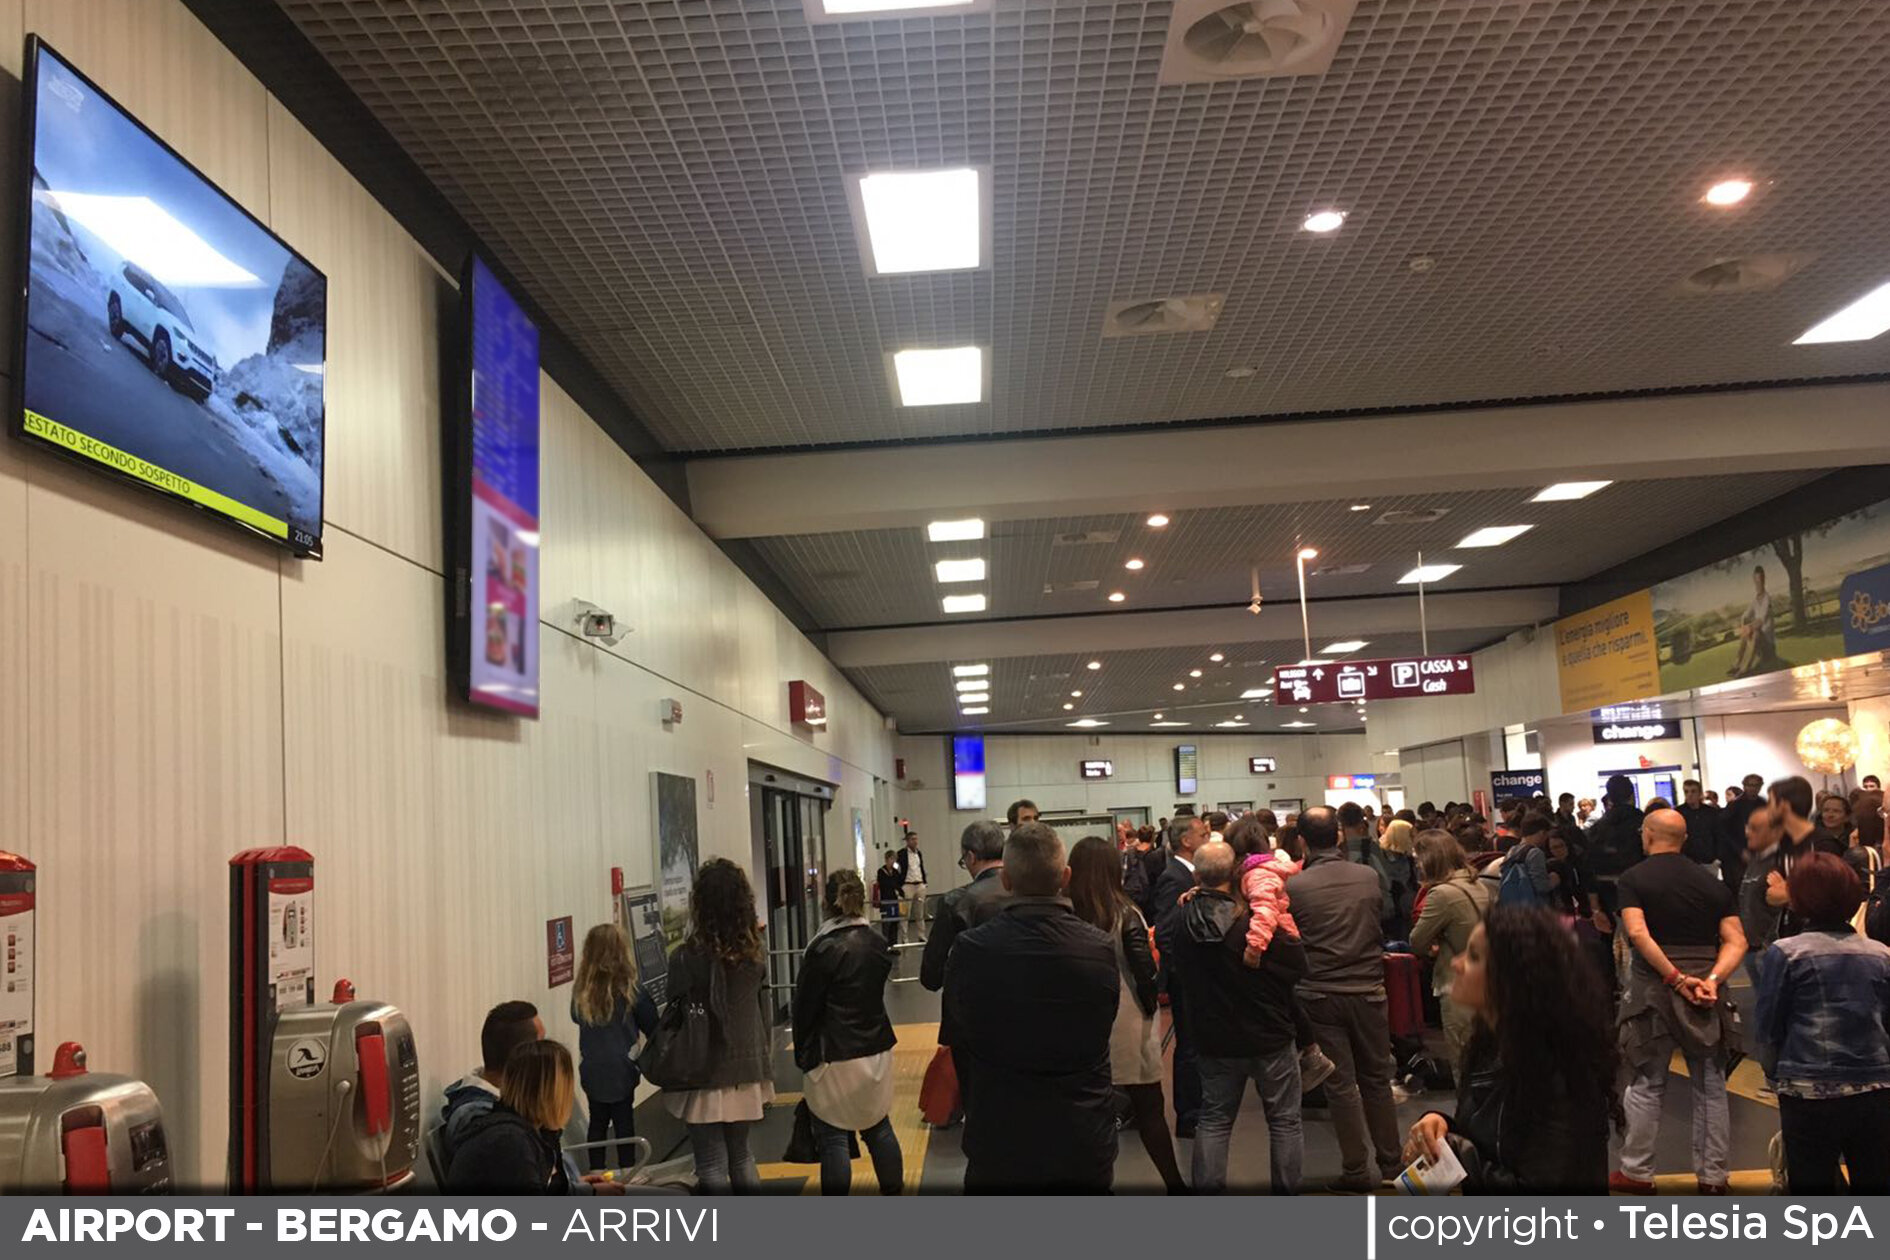 T_airportBergamo2.jpg